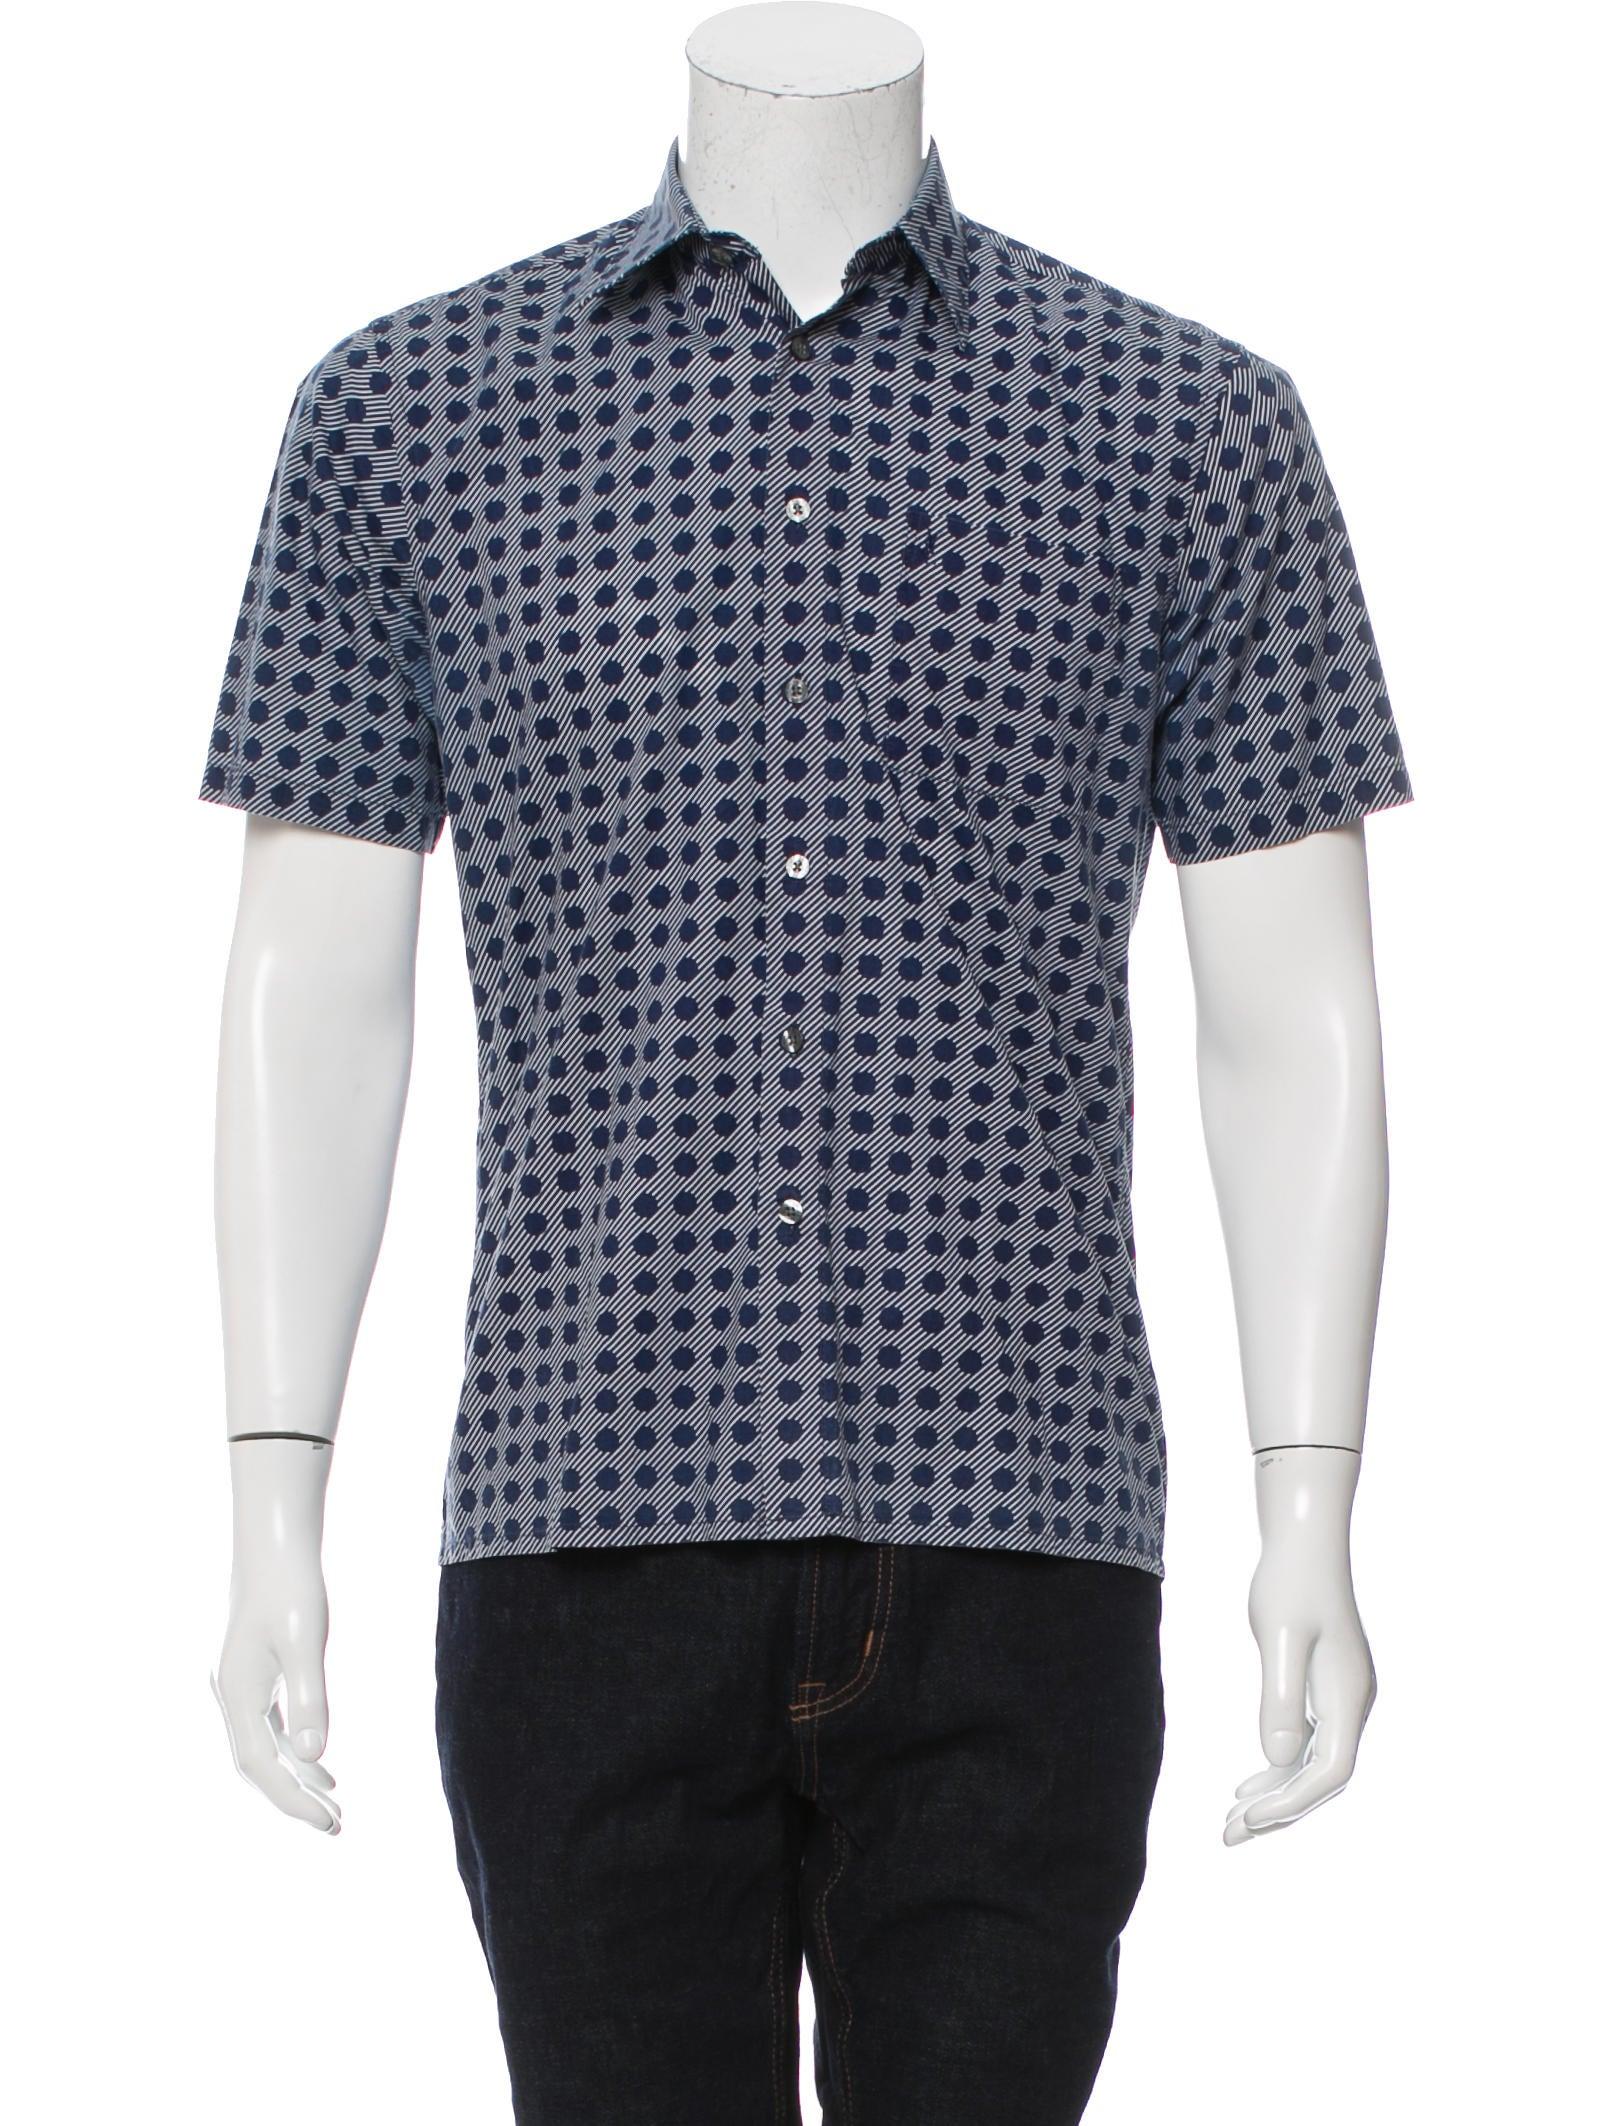 Yves saint laurent printed button up shirt clothing for Yves saint laurent white t shirt